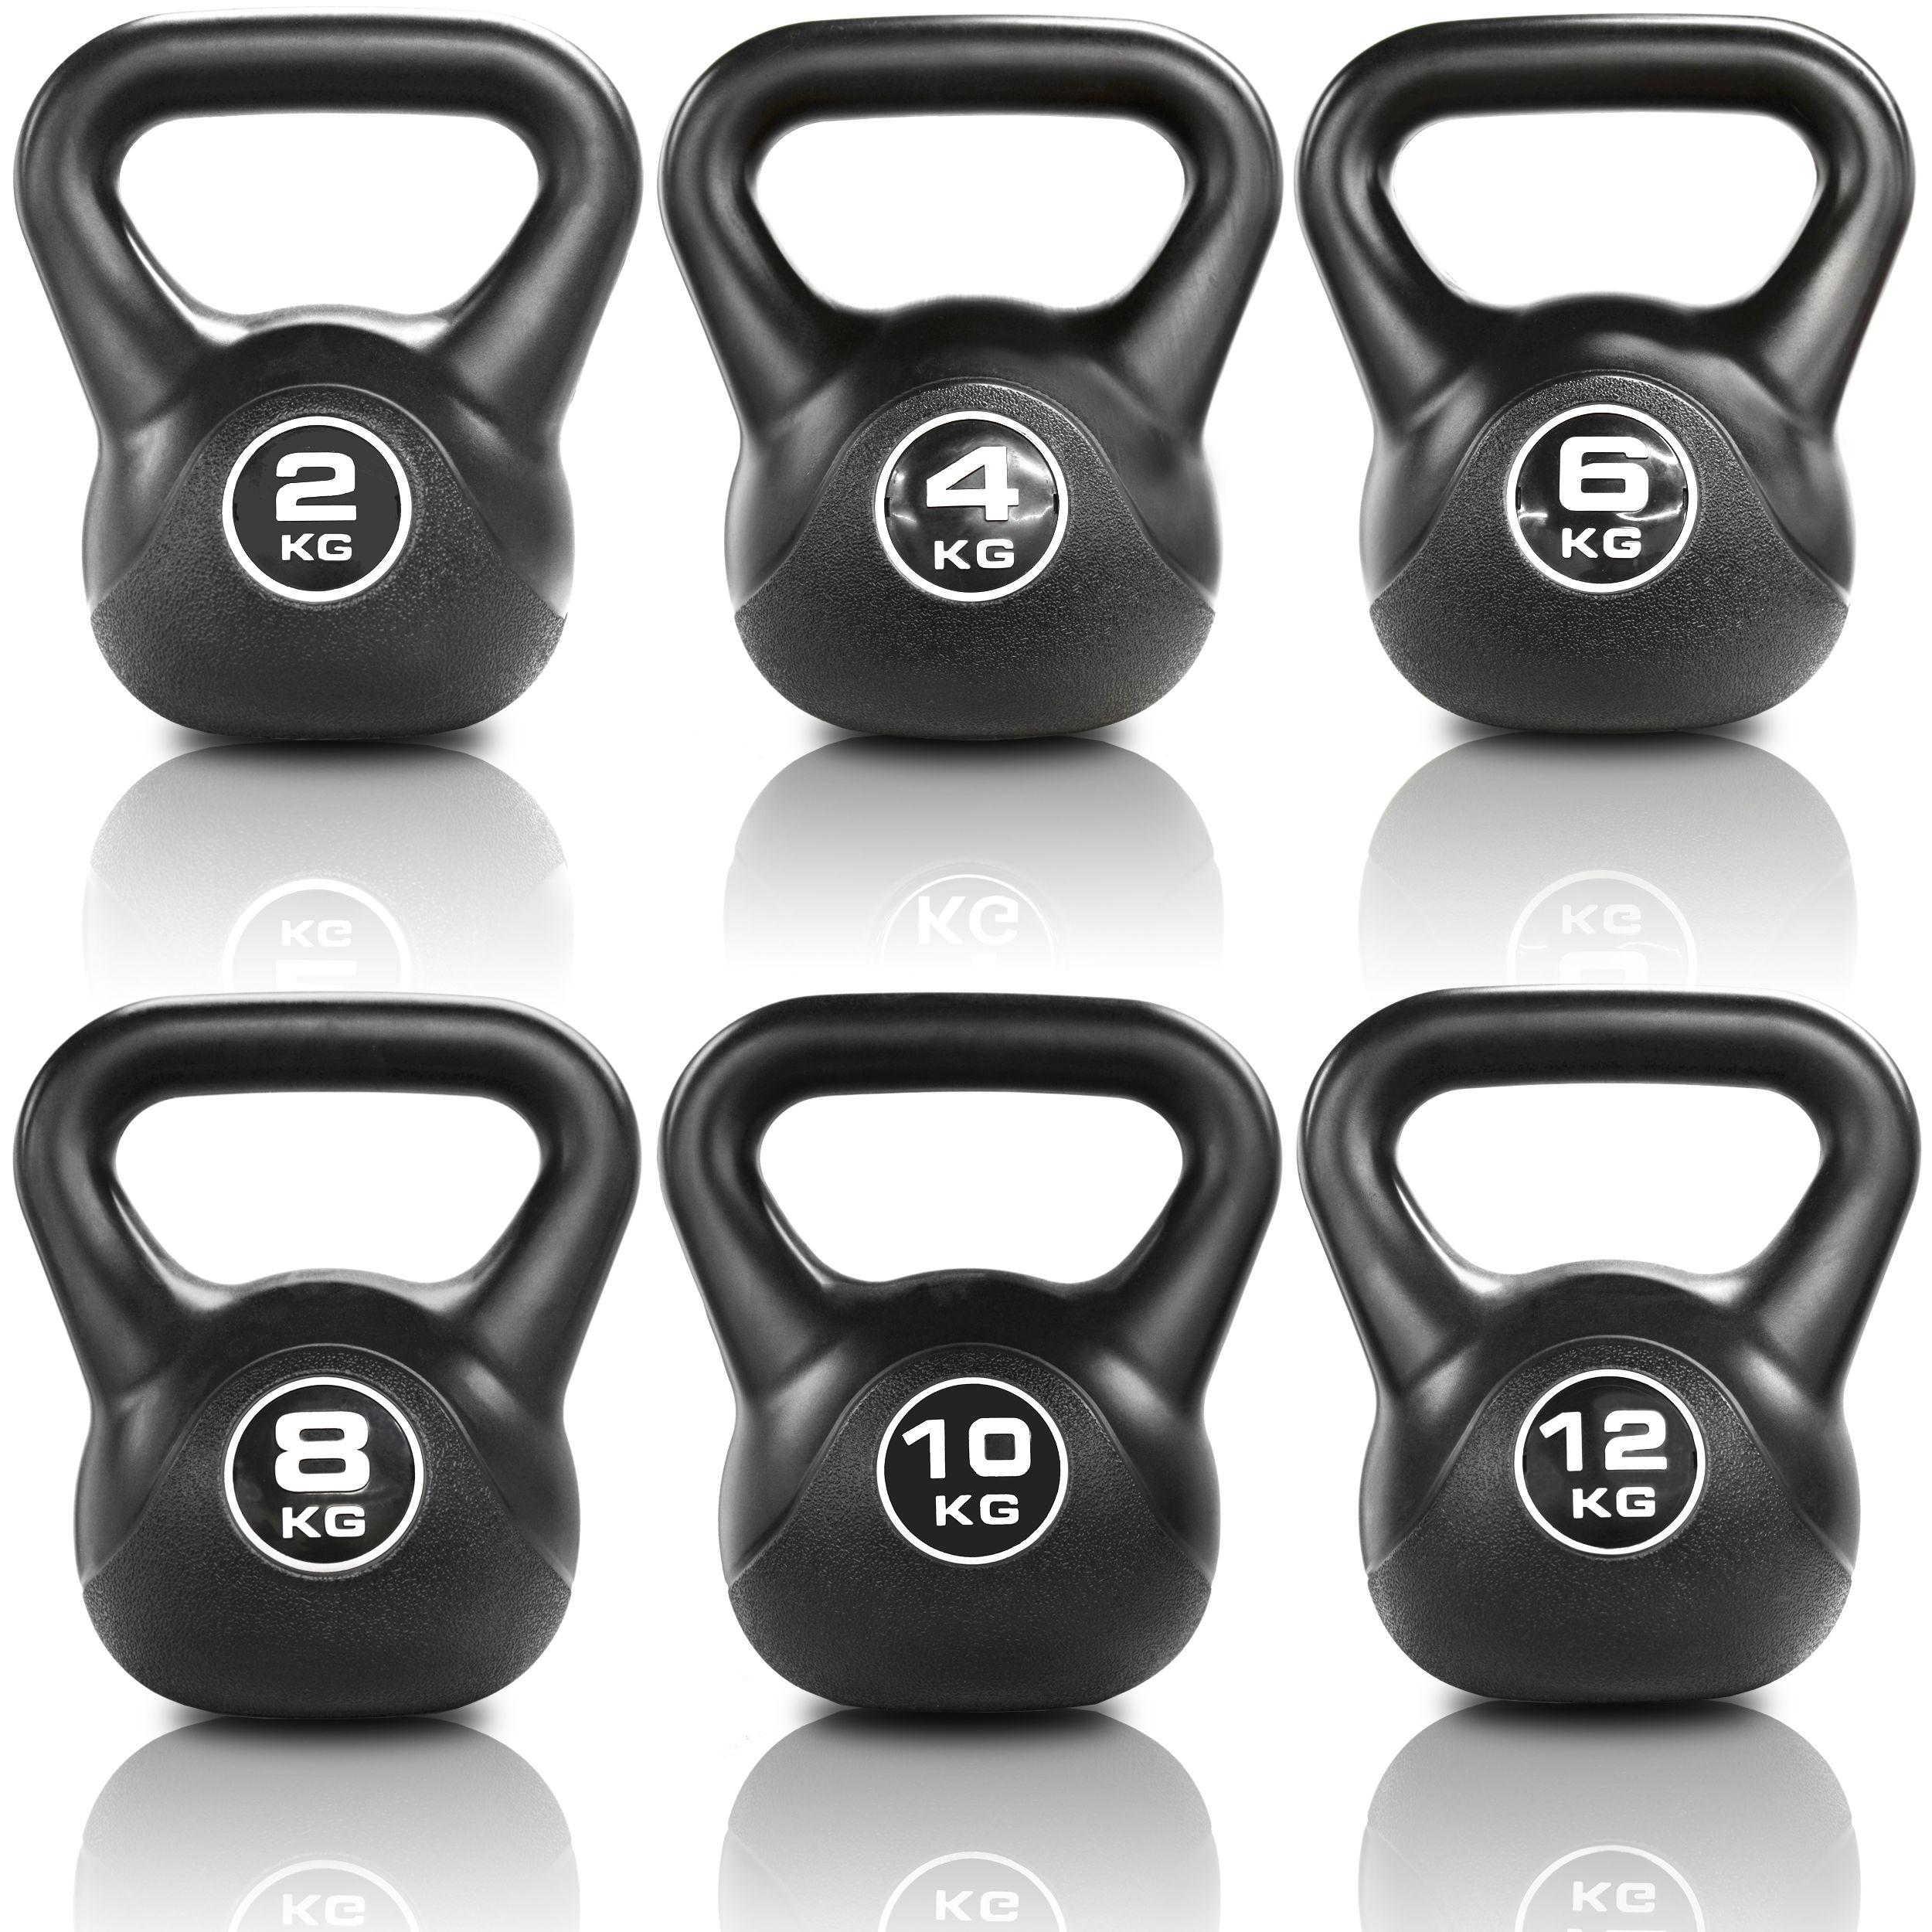 Jll Black Vinyl Kettlebells 2kg 16kg Weight Training Equipment Kettlebell At Home Gym